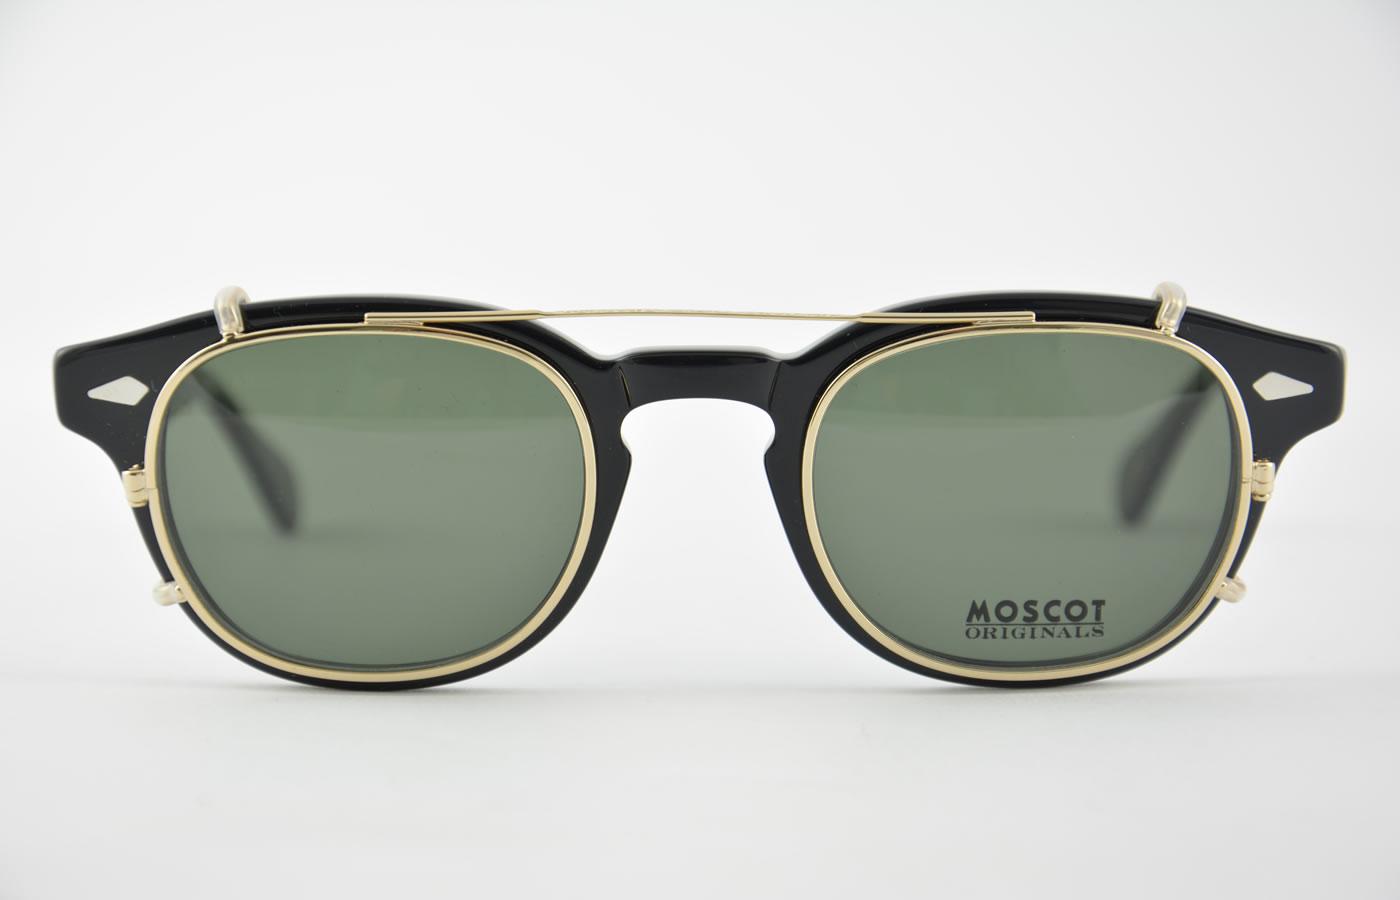 5763ed851ae Moscot - Lemtosh - Black + Cliptosh - Gold G-15 ...